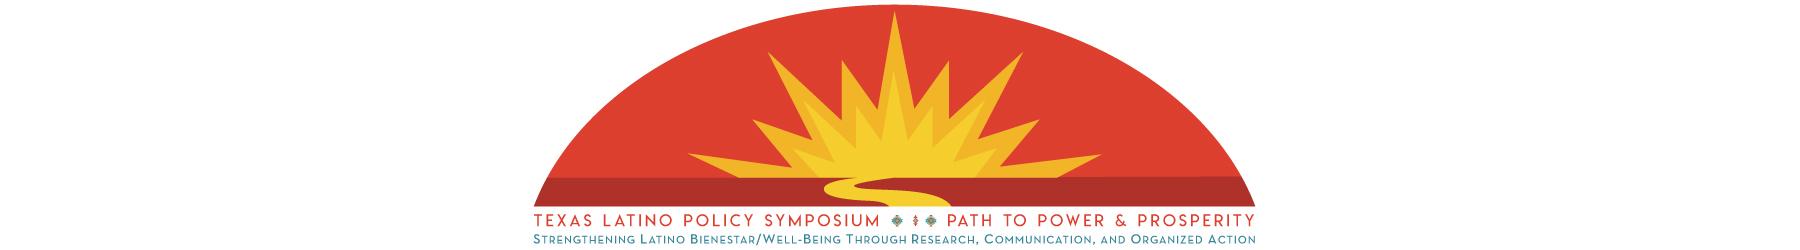 Texas Latino Policy Symposium